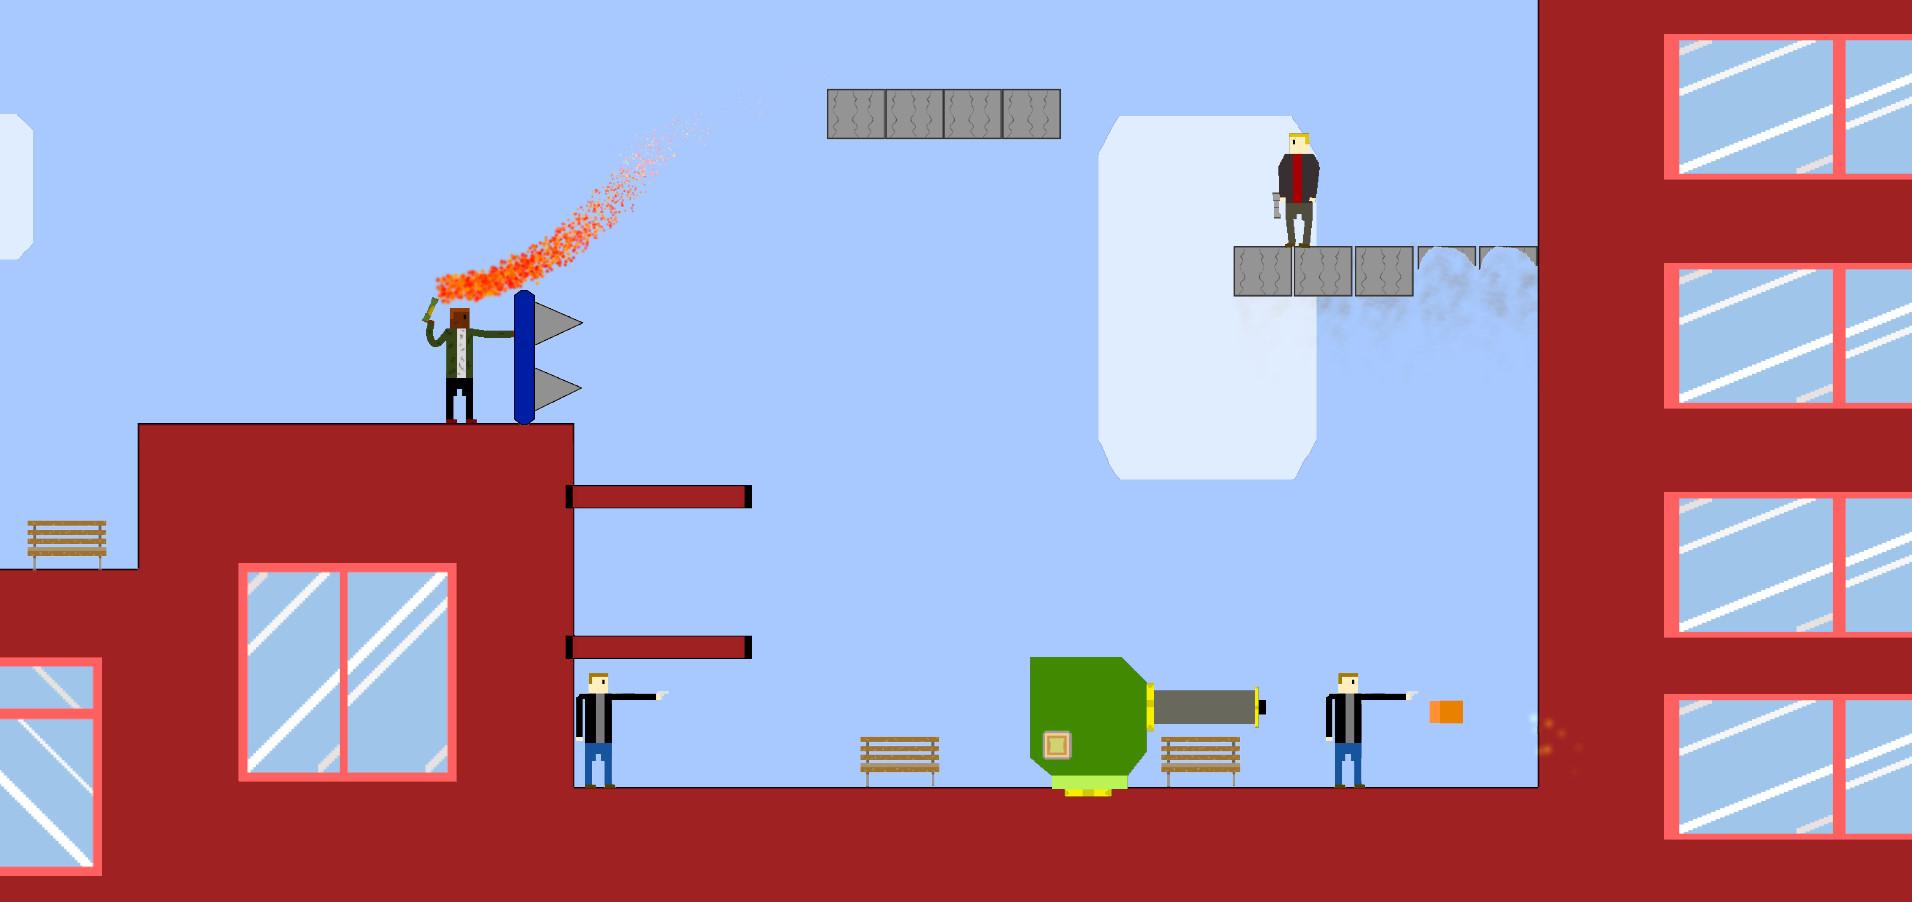 screenshot end level 1_3.jpg